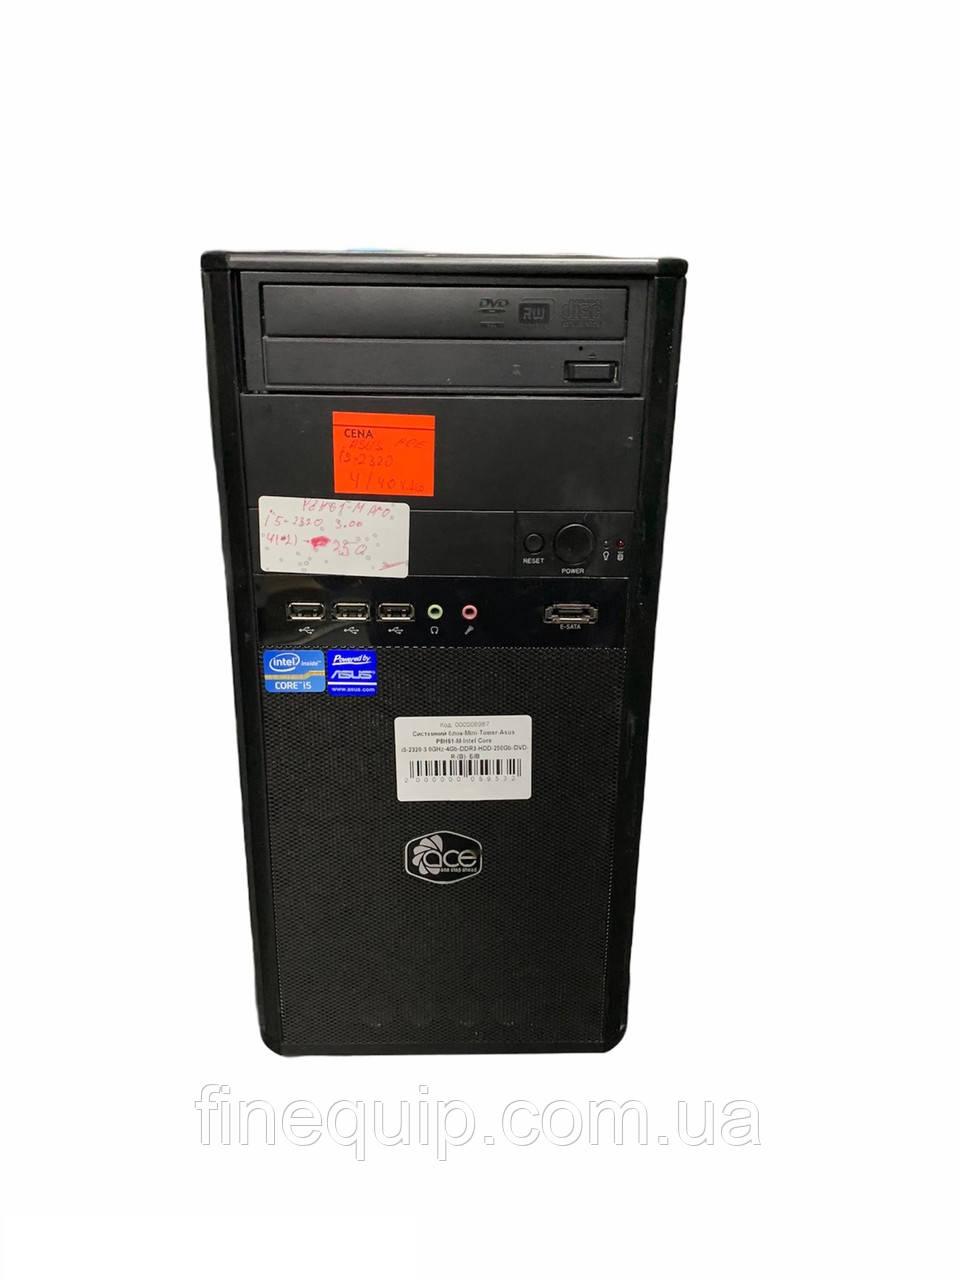 Системный блок mini tower-Asus P8H61-MX-Intel Pentium G2130-3.2GHz-4Gb-DDR3-HDD-500Gb-(B)- Б/У